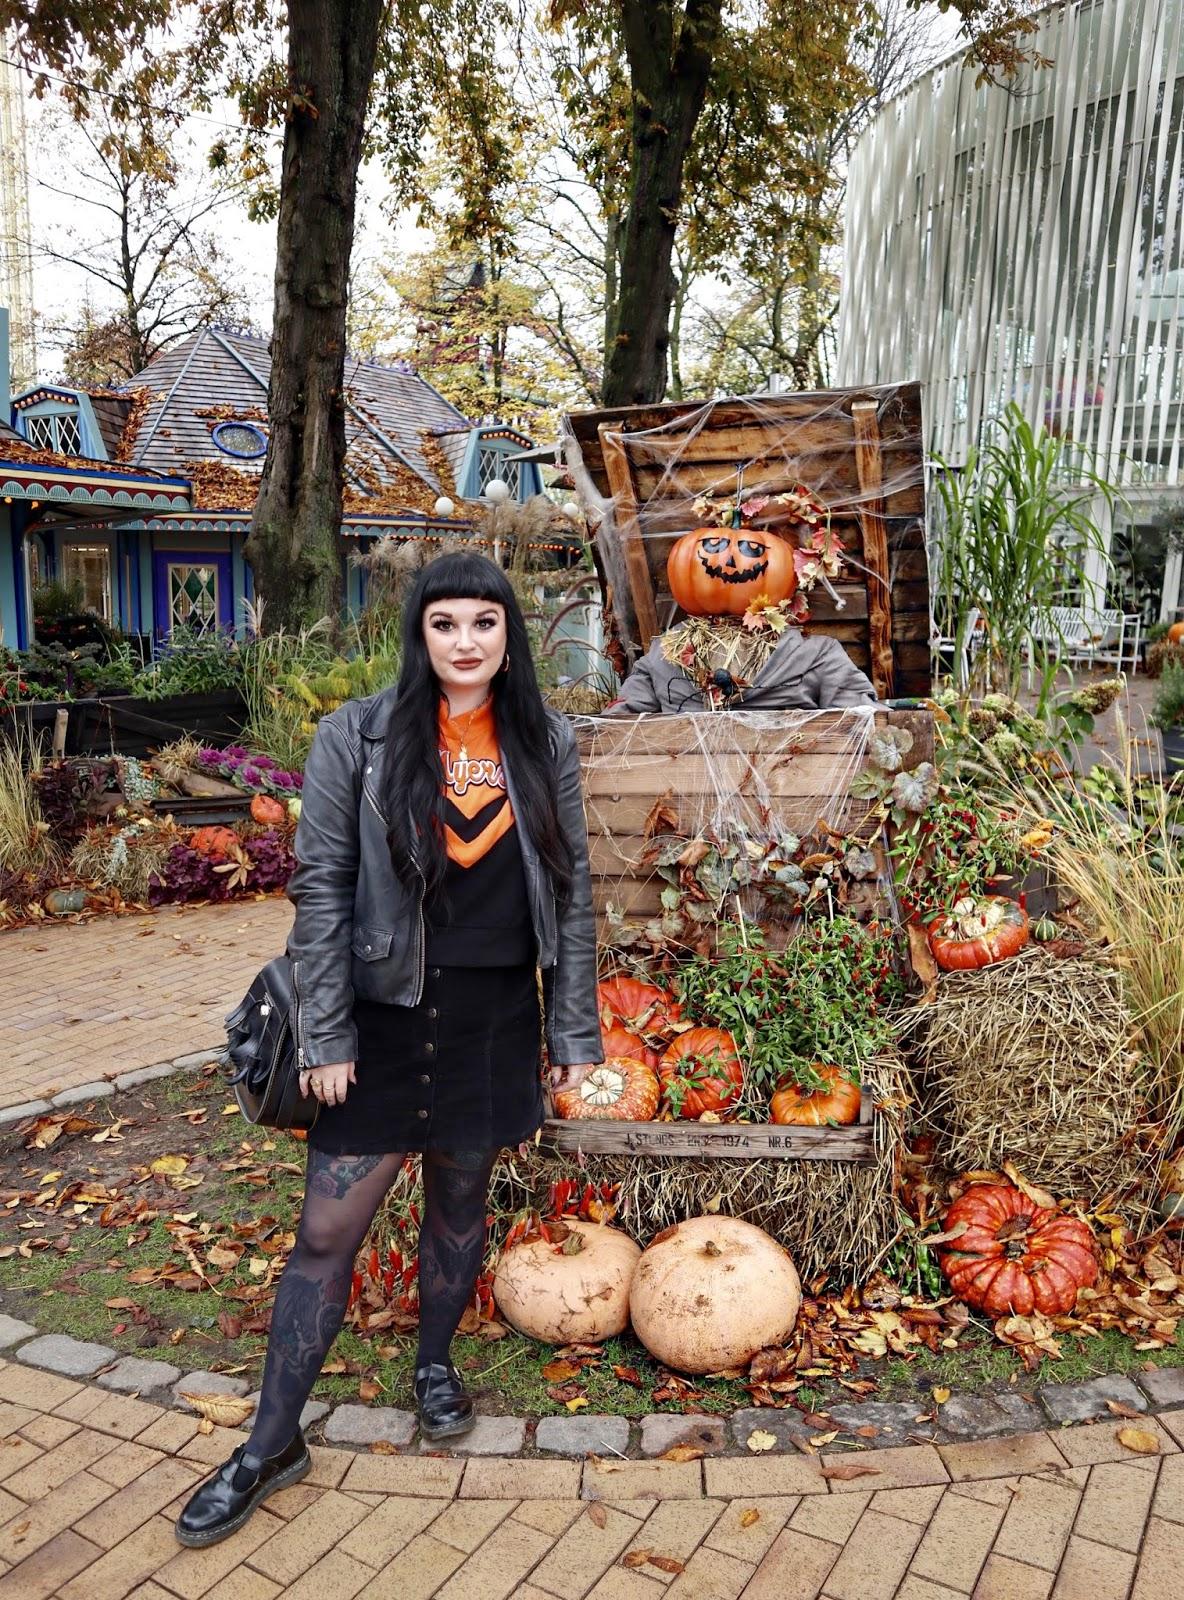 Halloween Tivoli theme park